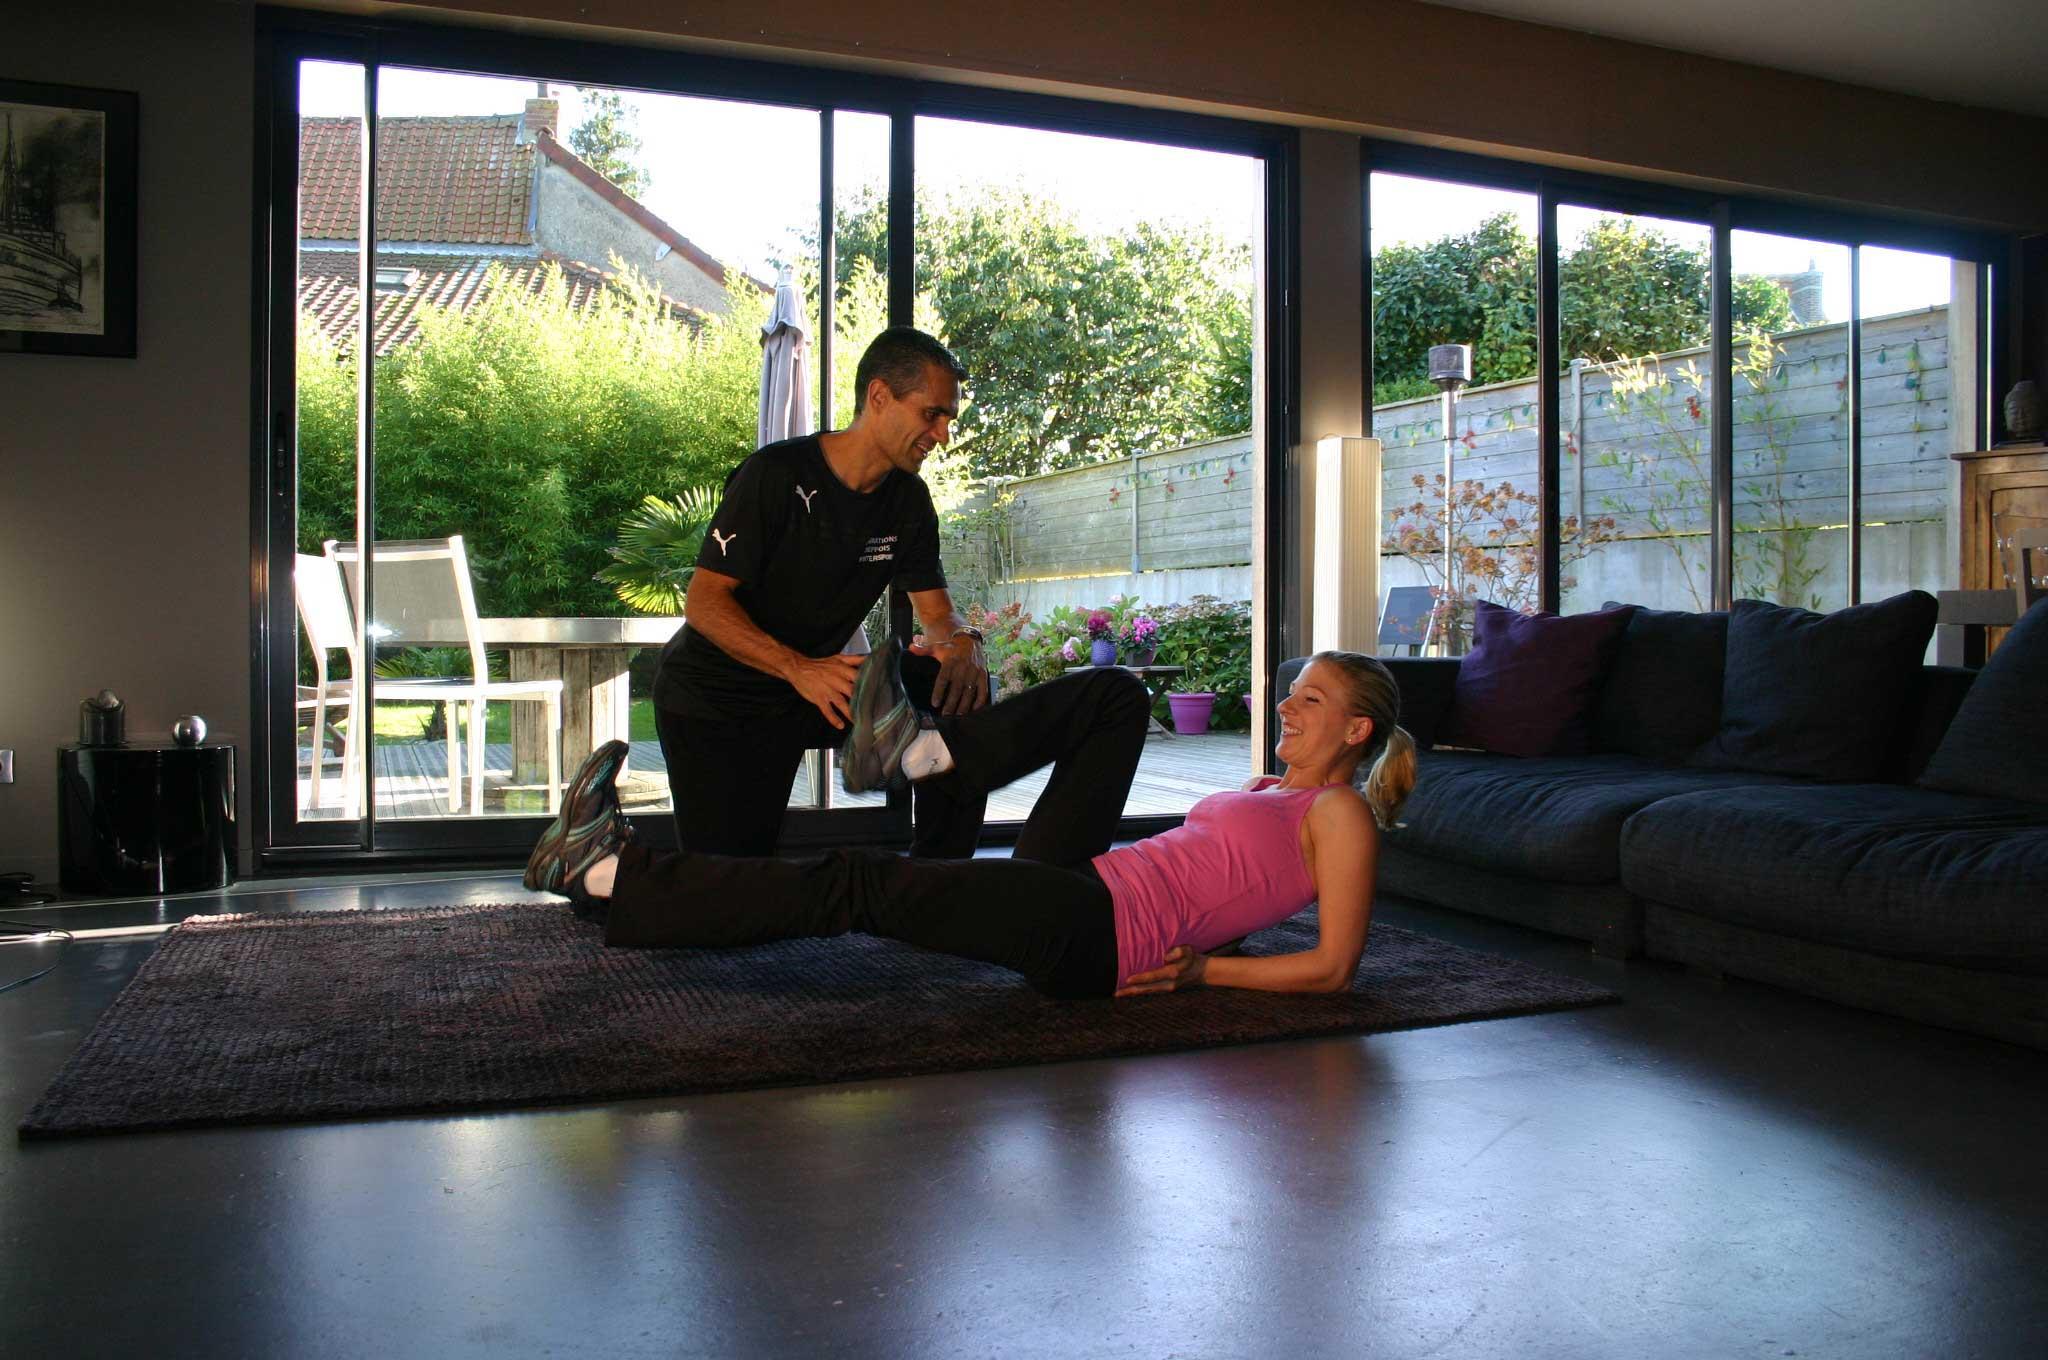 coaching remise en forme dieppe rouen. Black Bedroom Furniture Sets. Home Design Ideas